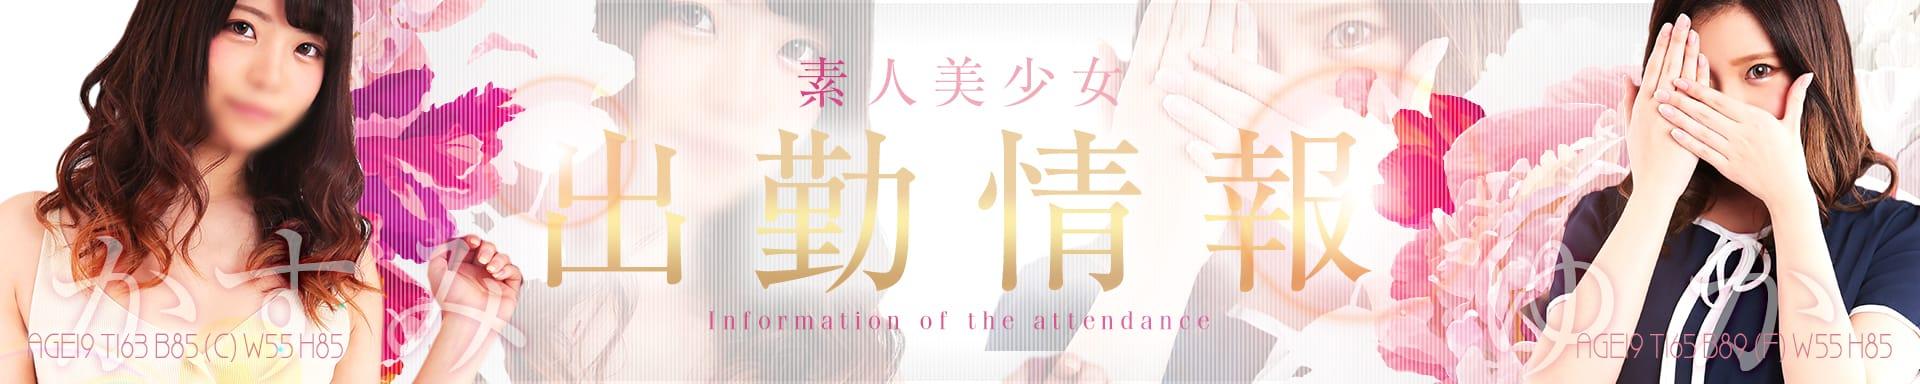 Princess Selection~プリンセスセレクション~金沢店 その2